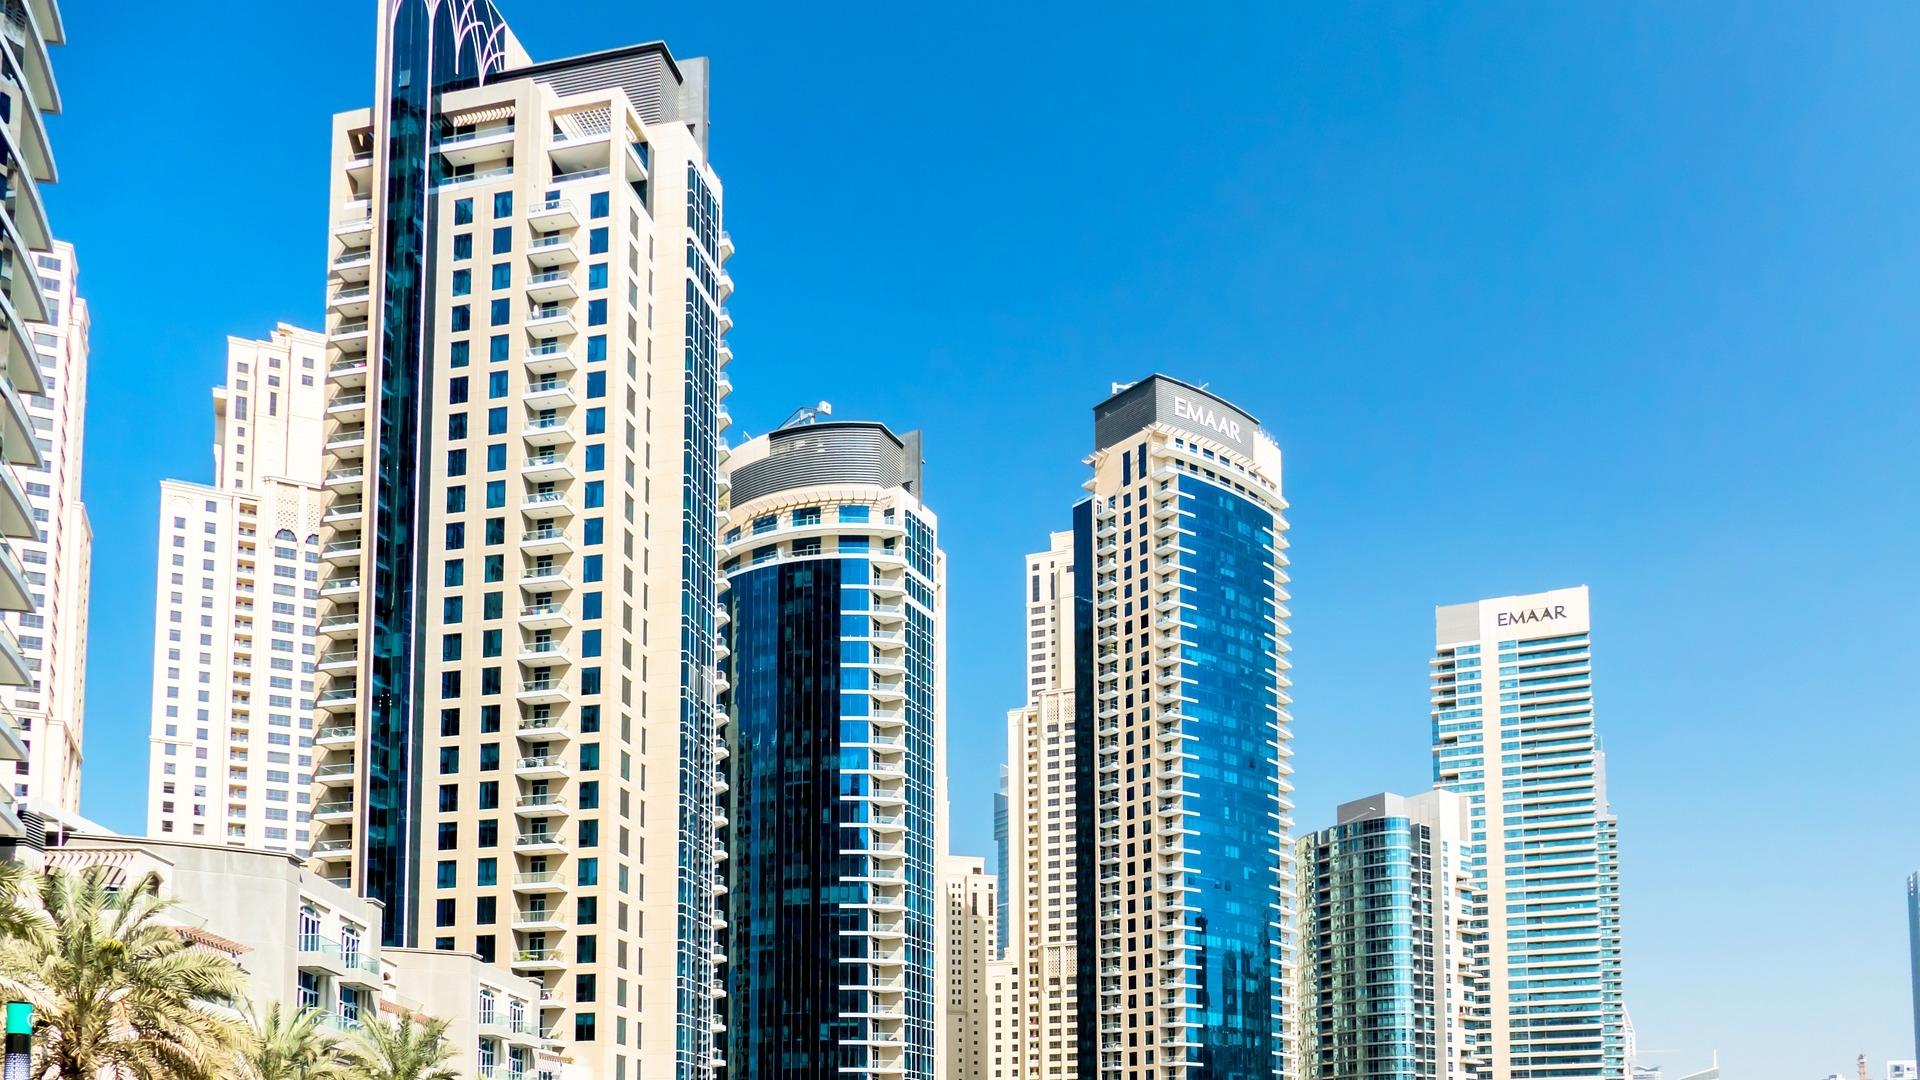 Dubai Modern Buildings Architecture Close Up Wallpaper   Wallpaper 1920x1080